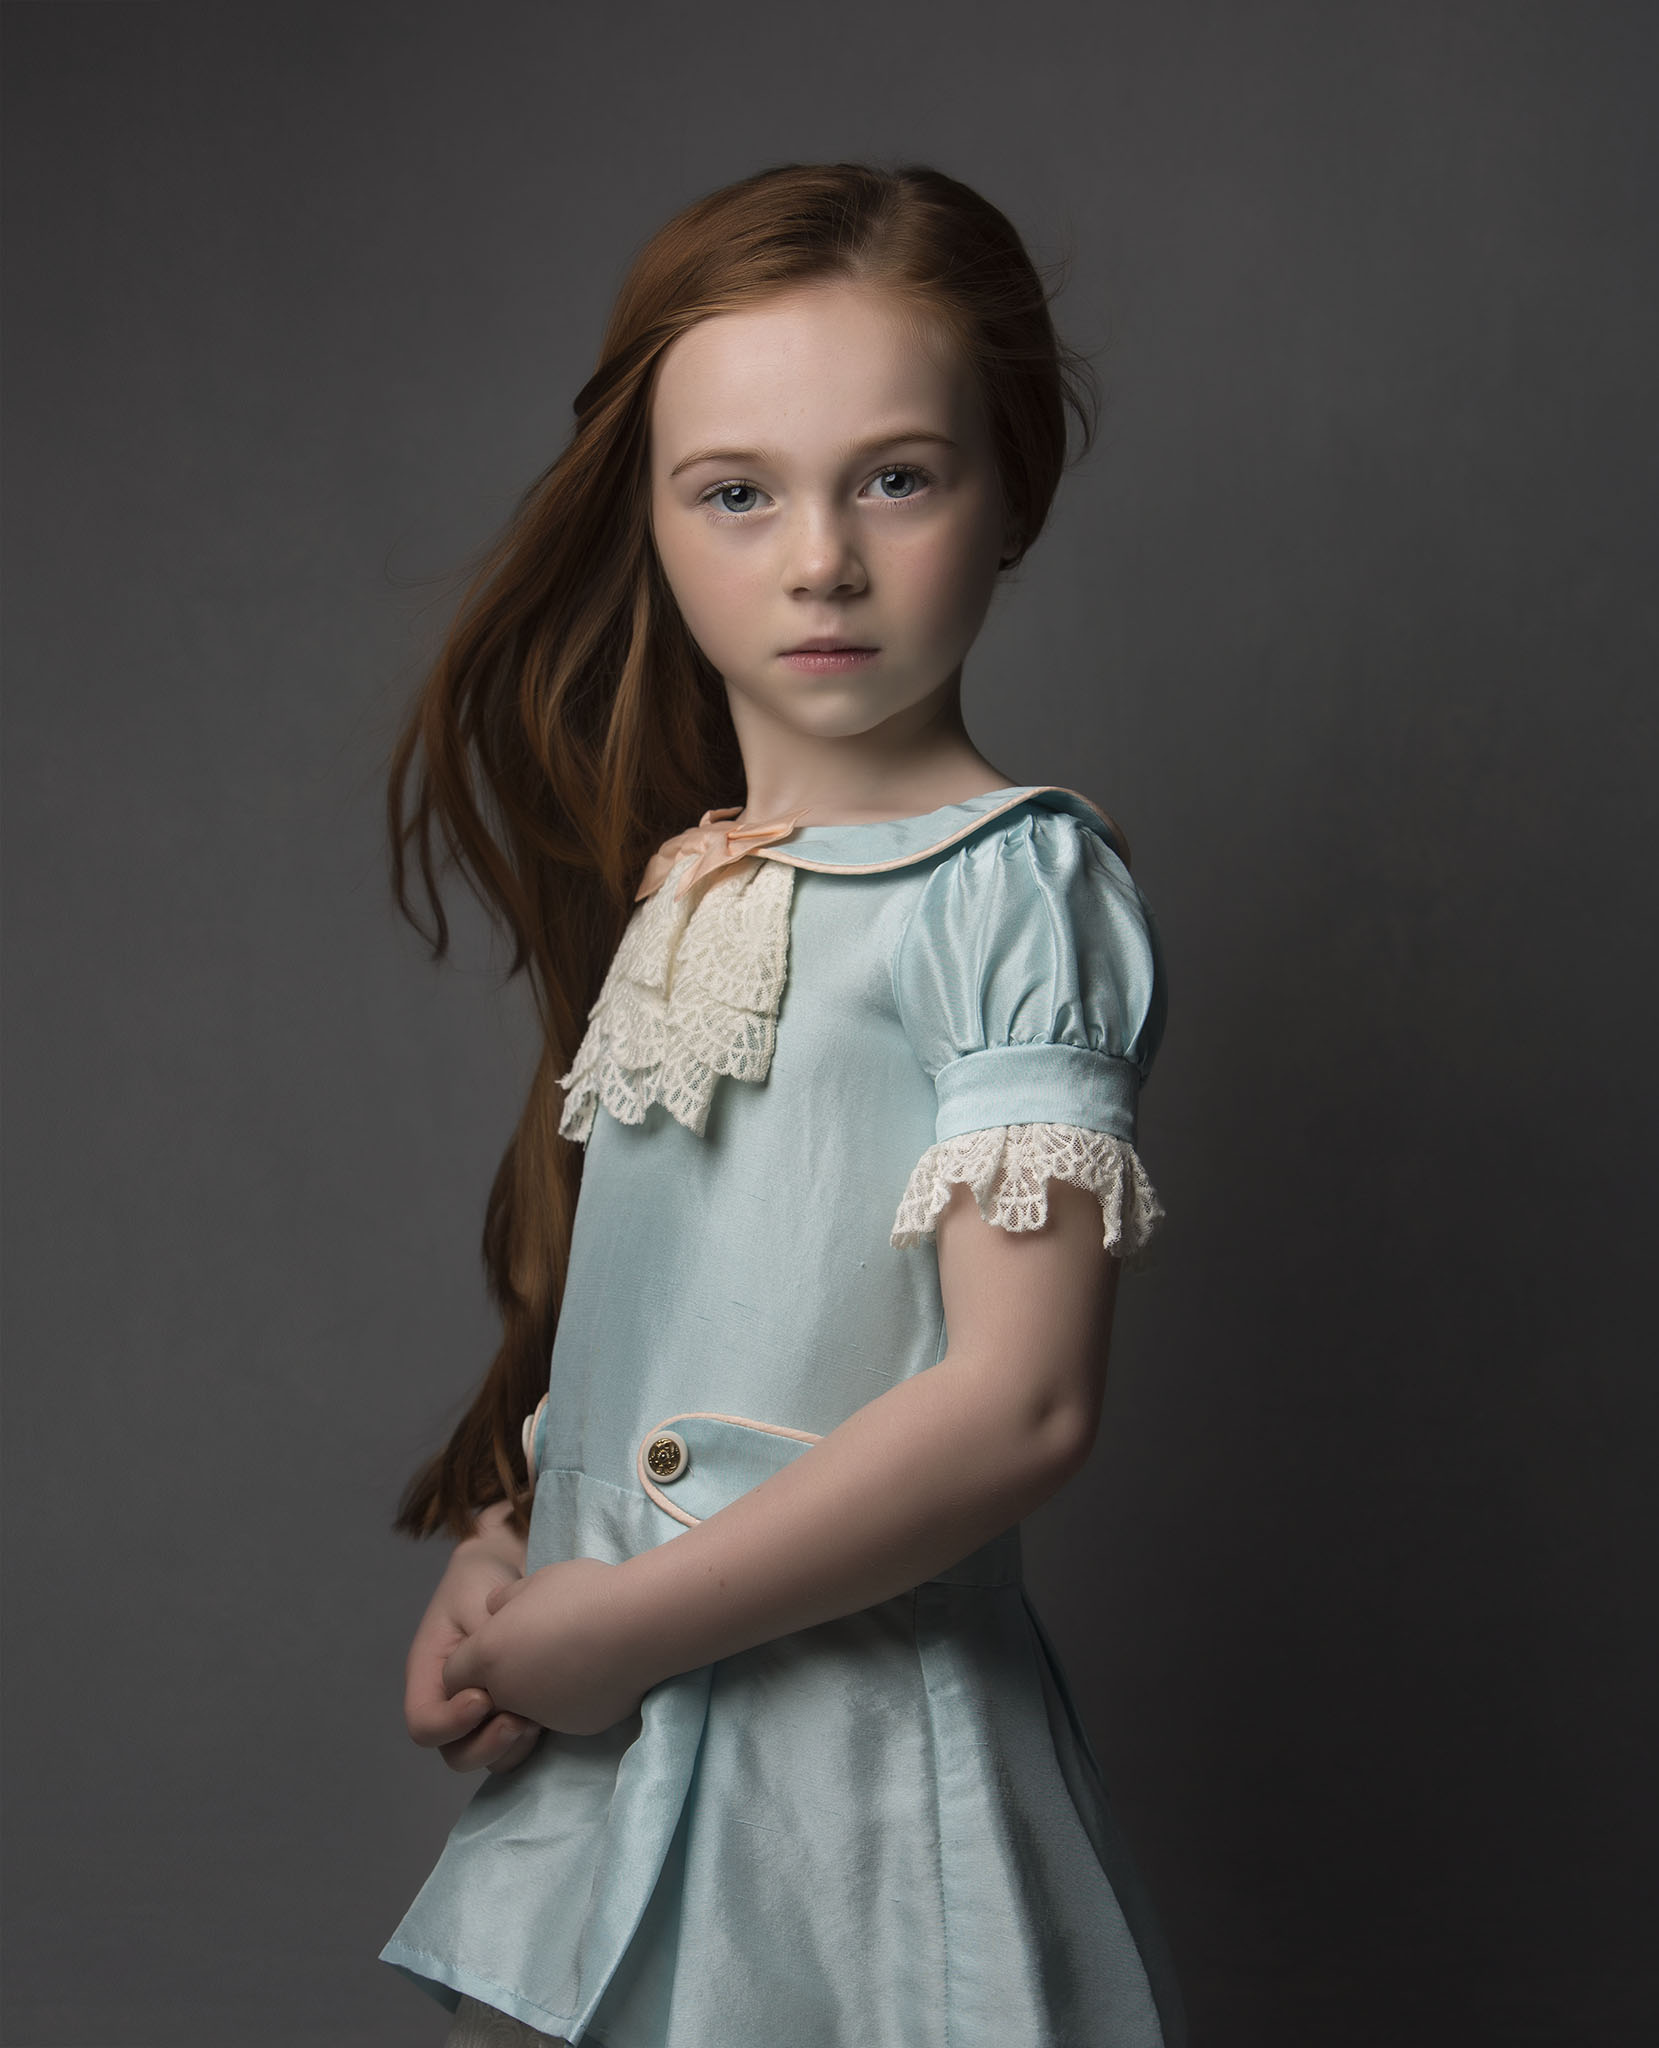 elizabethgphotography_kingslangley_hertfordshire_fineart_childrens_photography_29.jpg